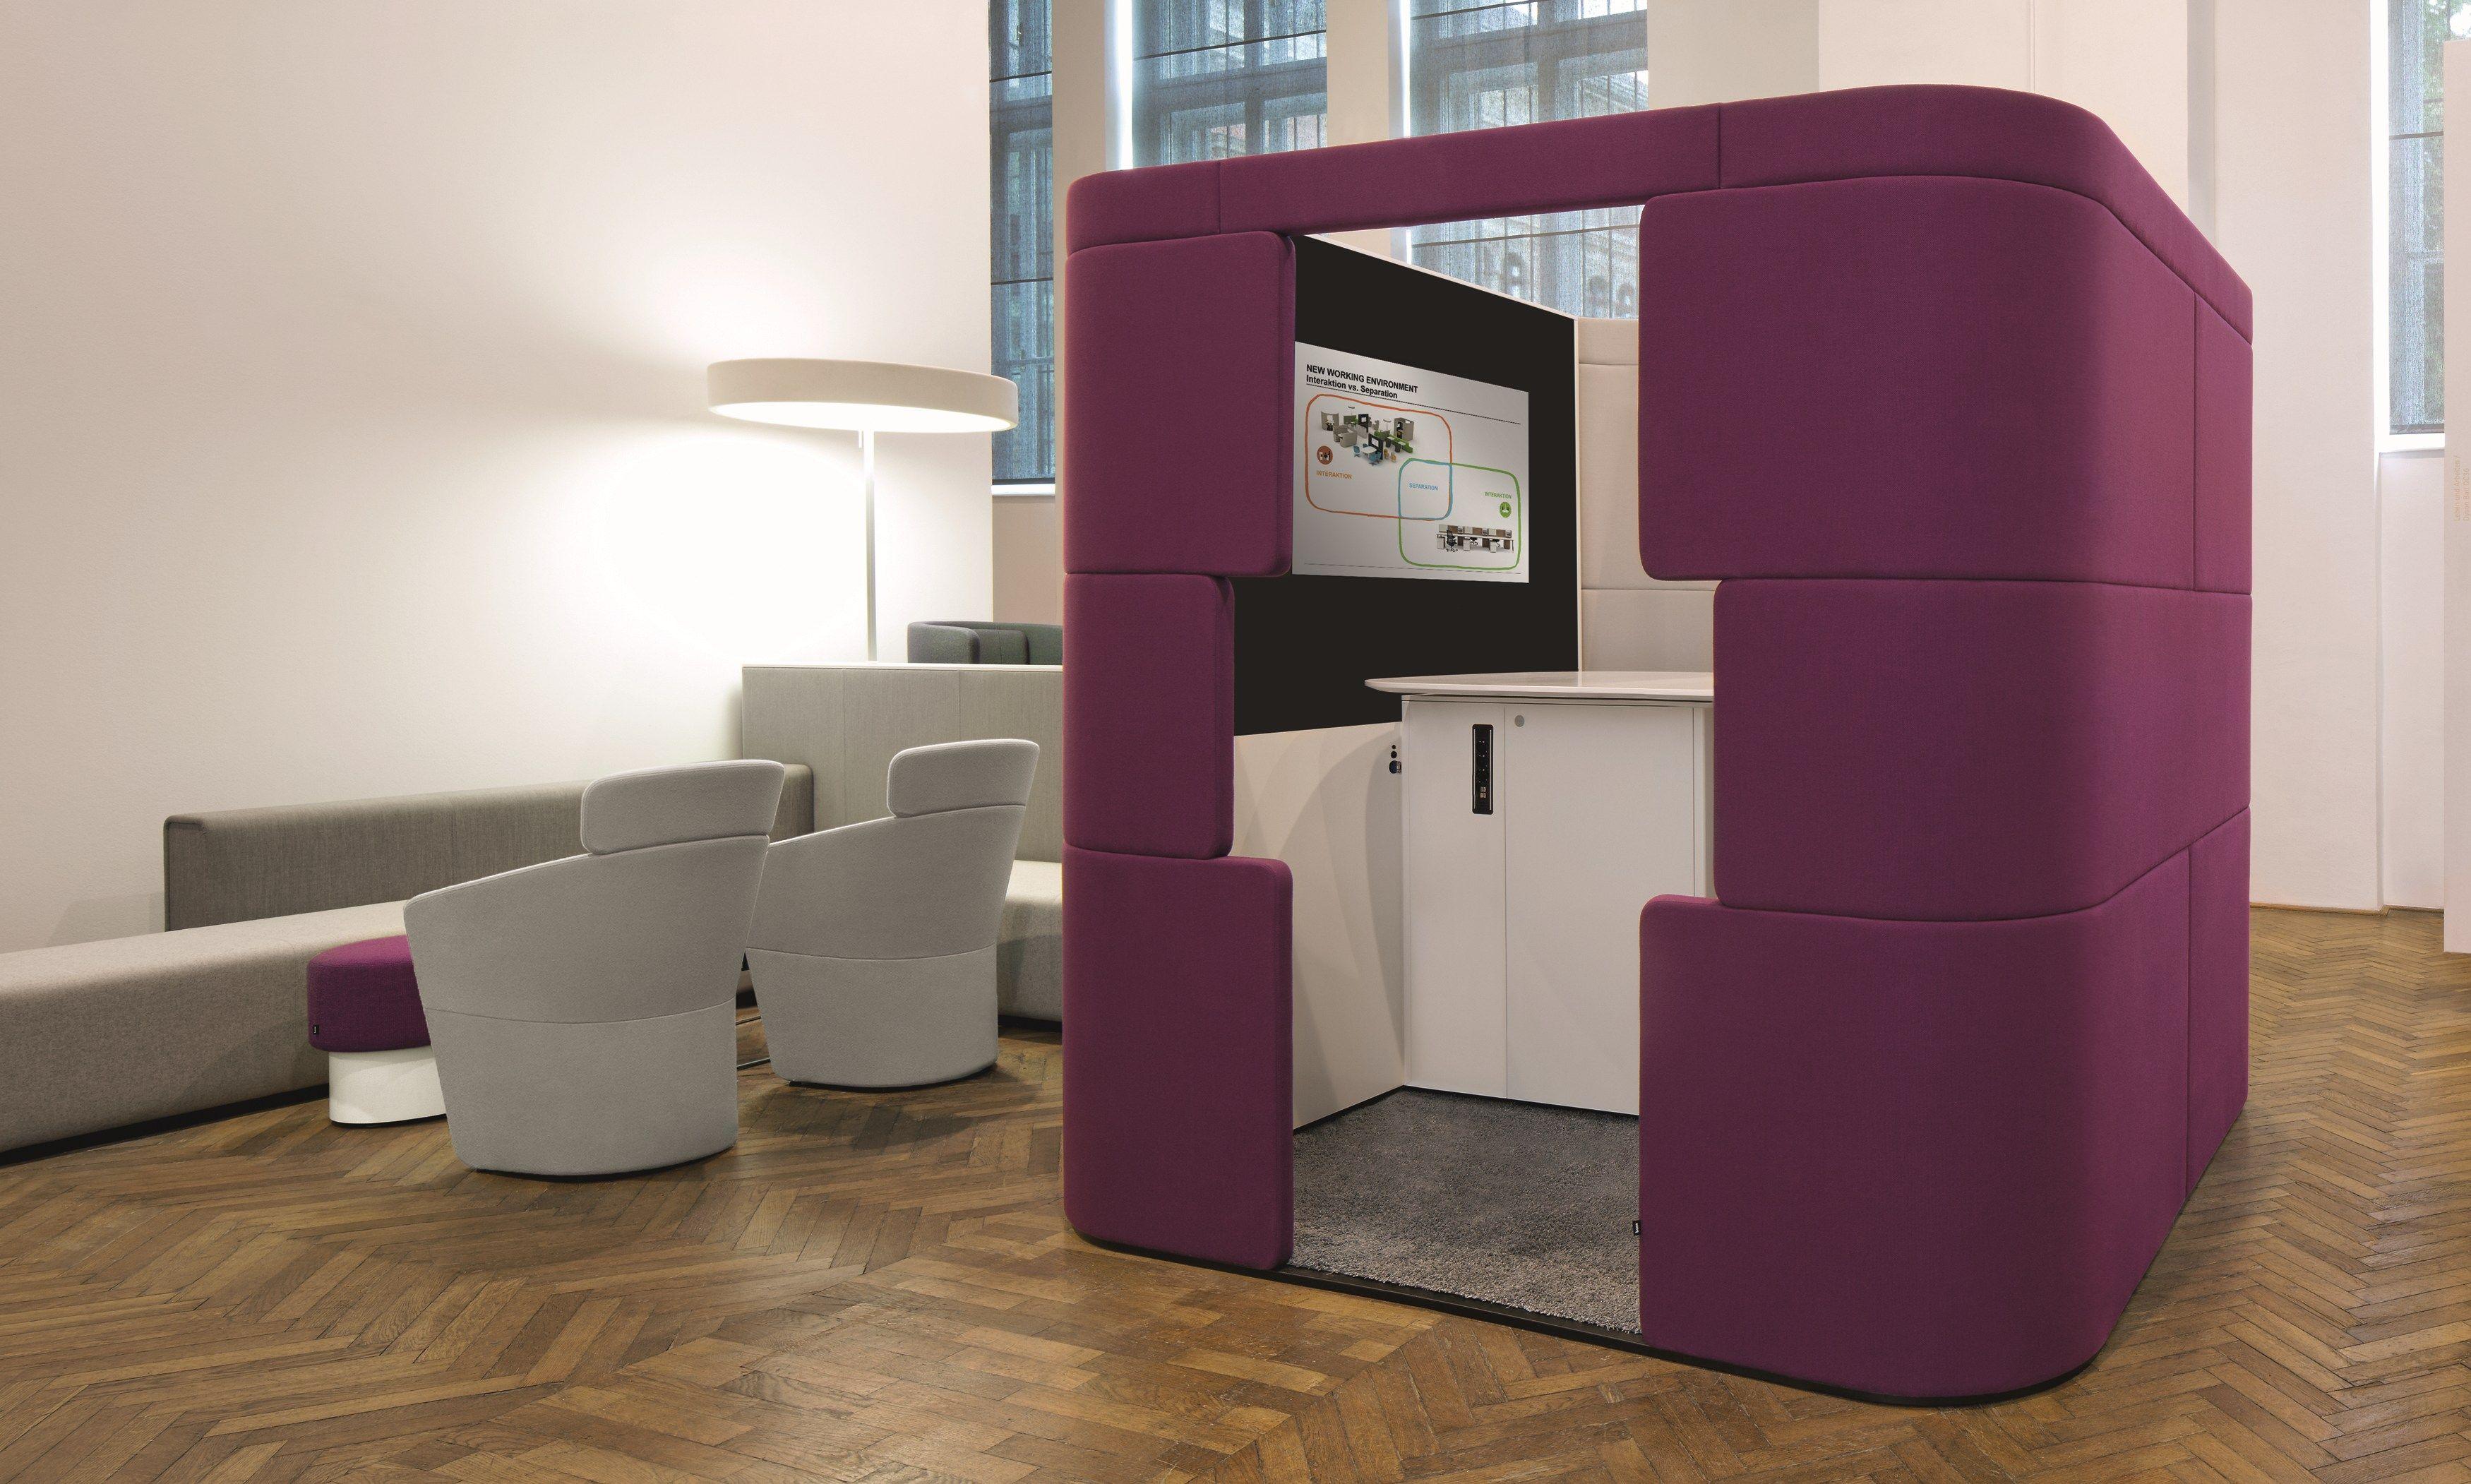 acoustic meeting pod with built in lights parcs toguna by bene design pearsonlloyd. Black Bedroom Furniture Sets. Home Design Ideas